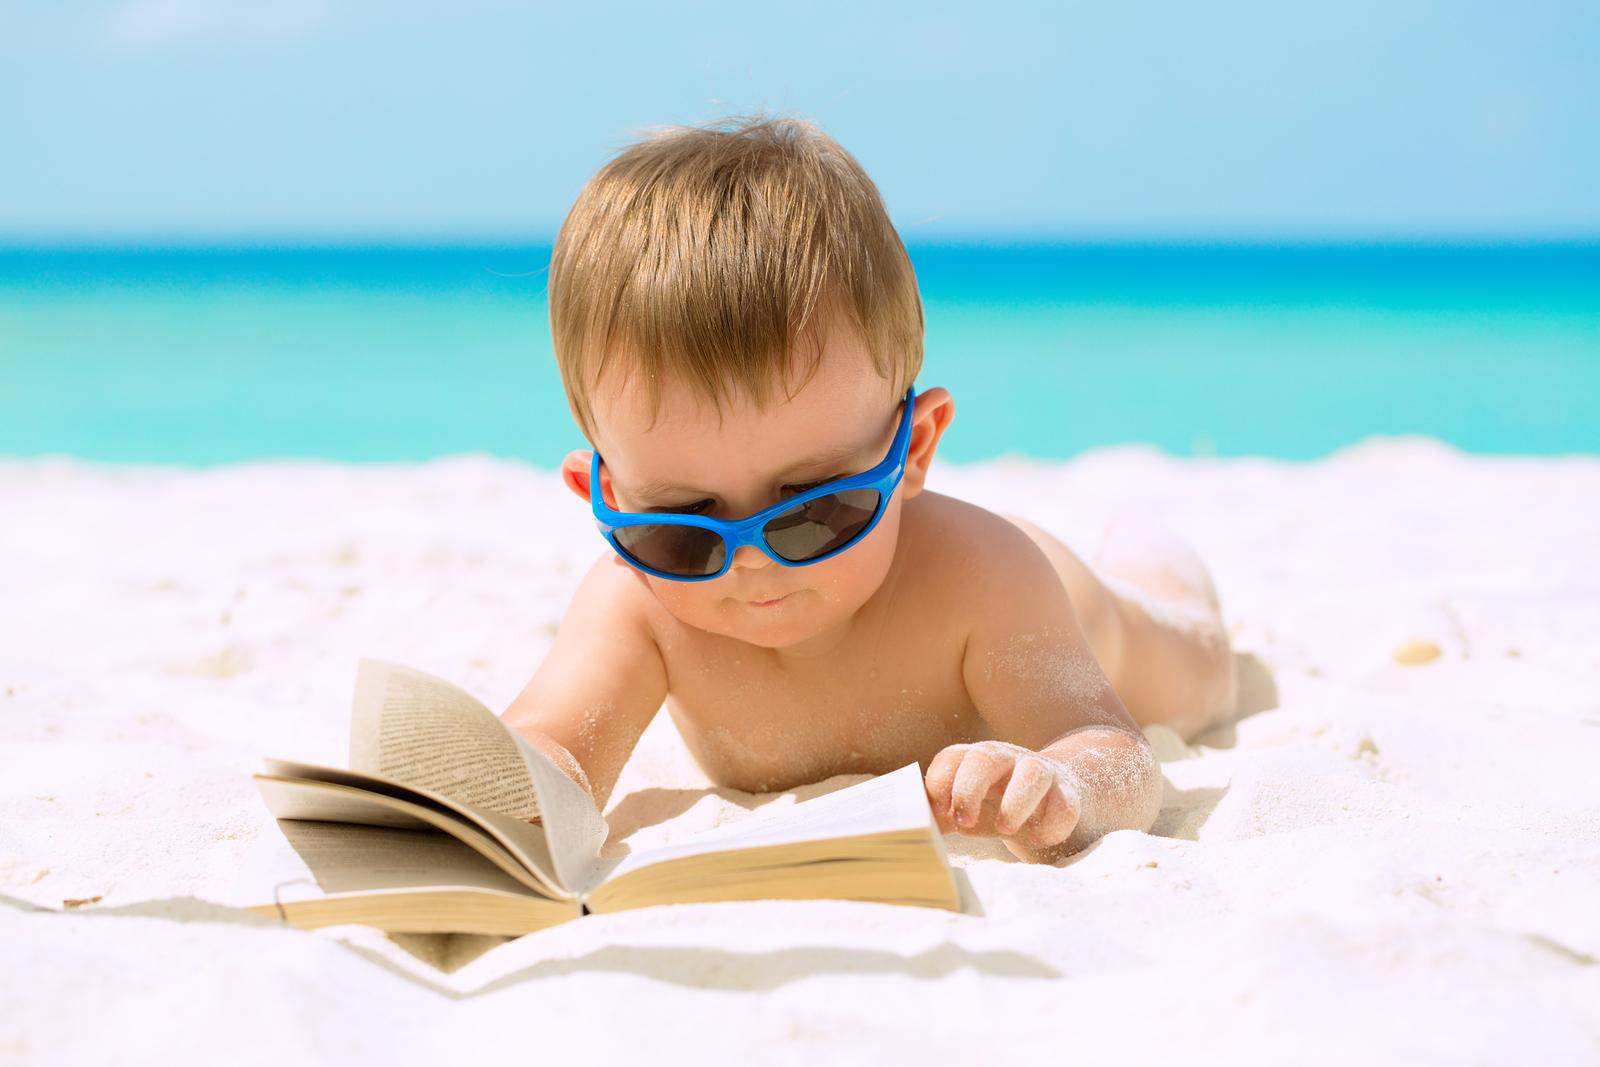 bigstock-Cute-Baby-Boy-On-Vacations-48858281